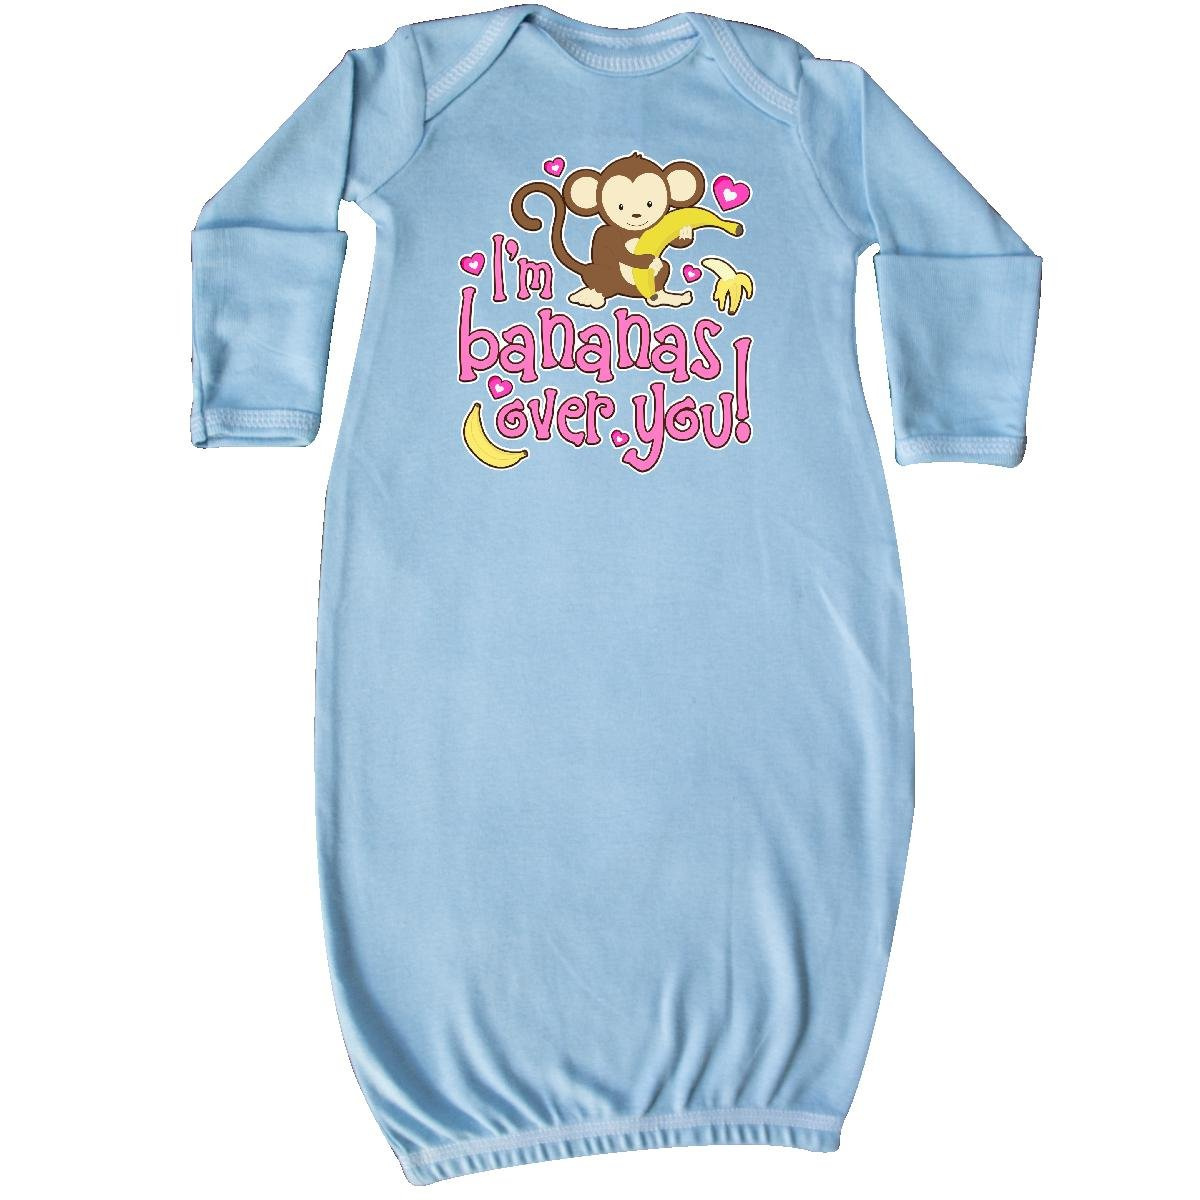 inktastic - I'm Bananas Over You Newborn Layette 14-153607-17-140-1418